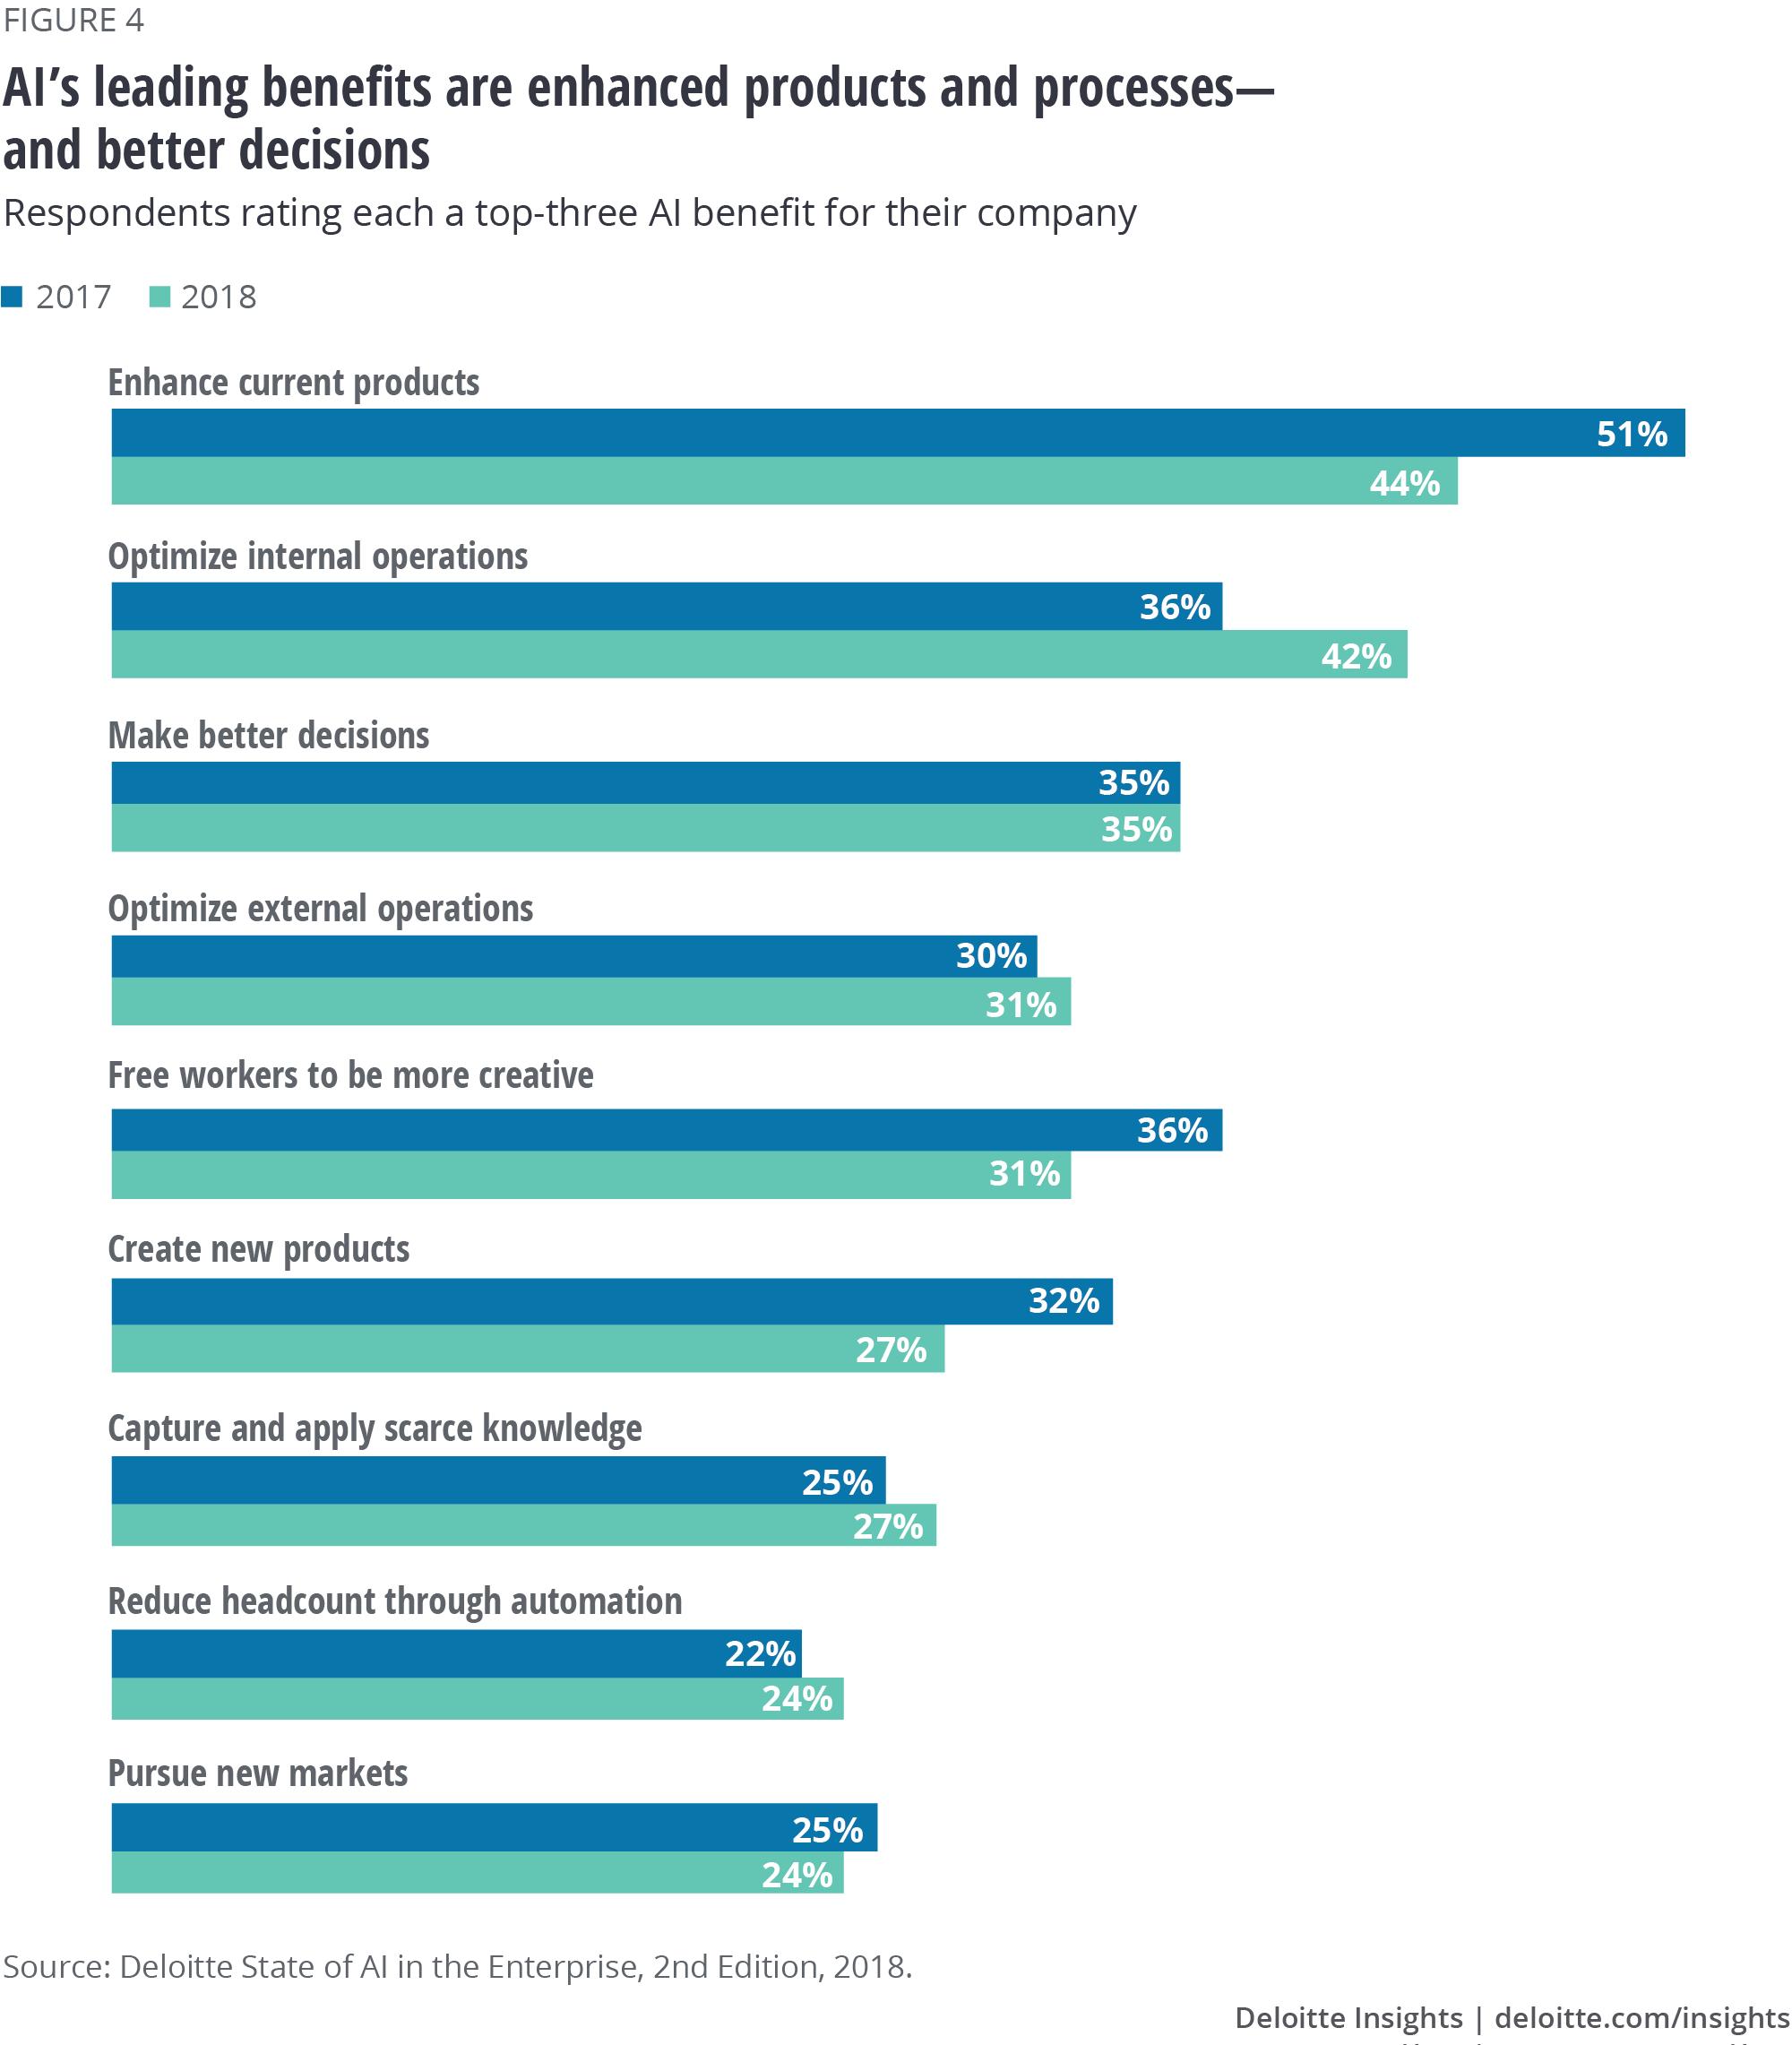 Cognitive and AI US survey | Deloitte Insights